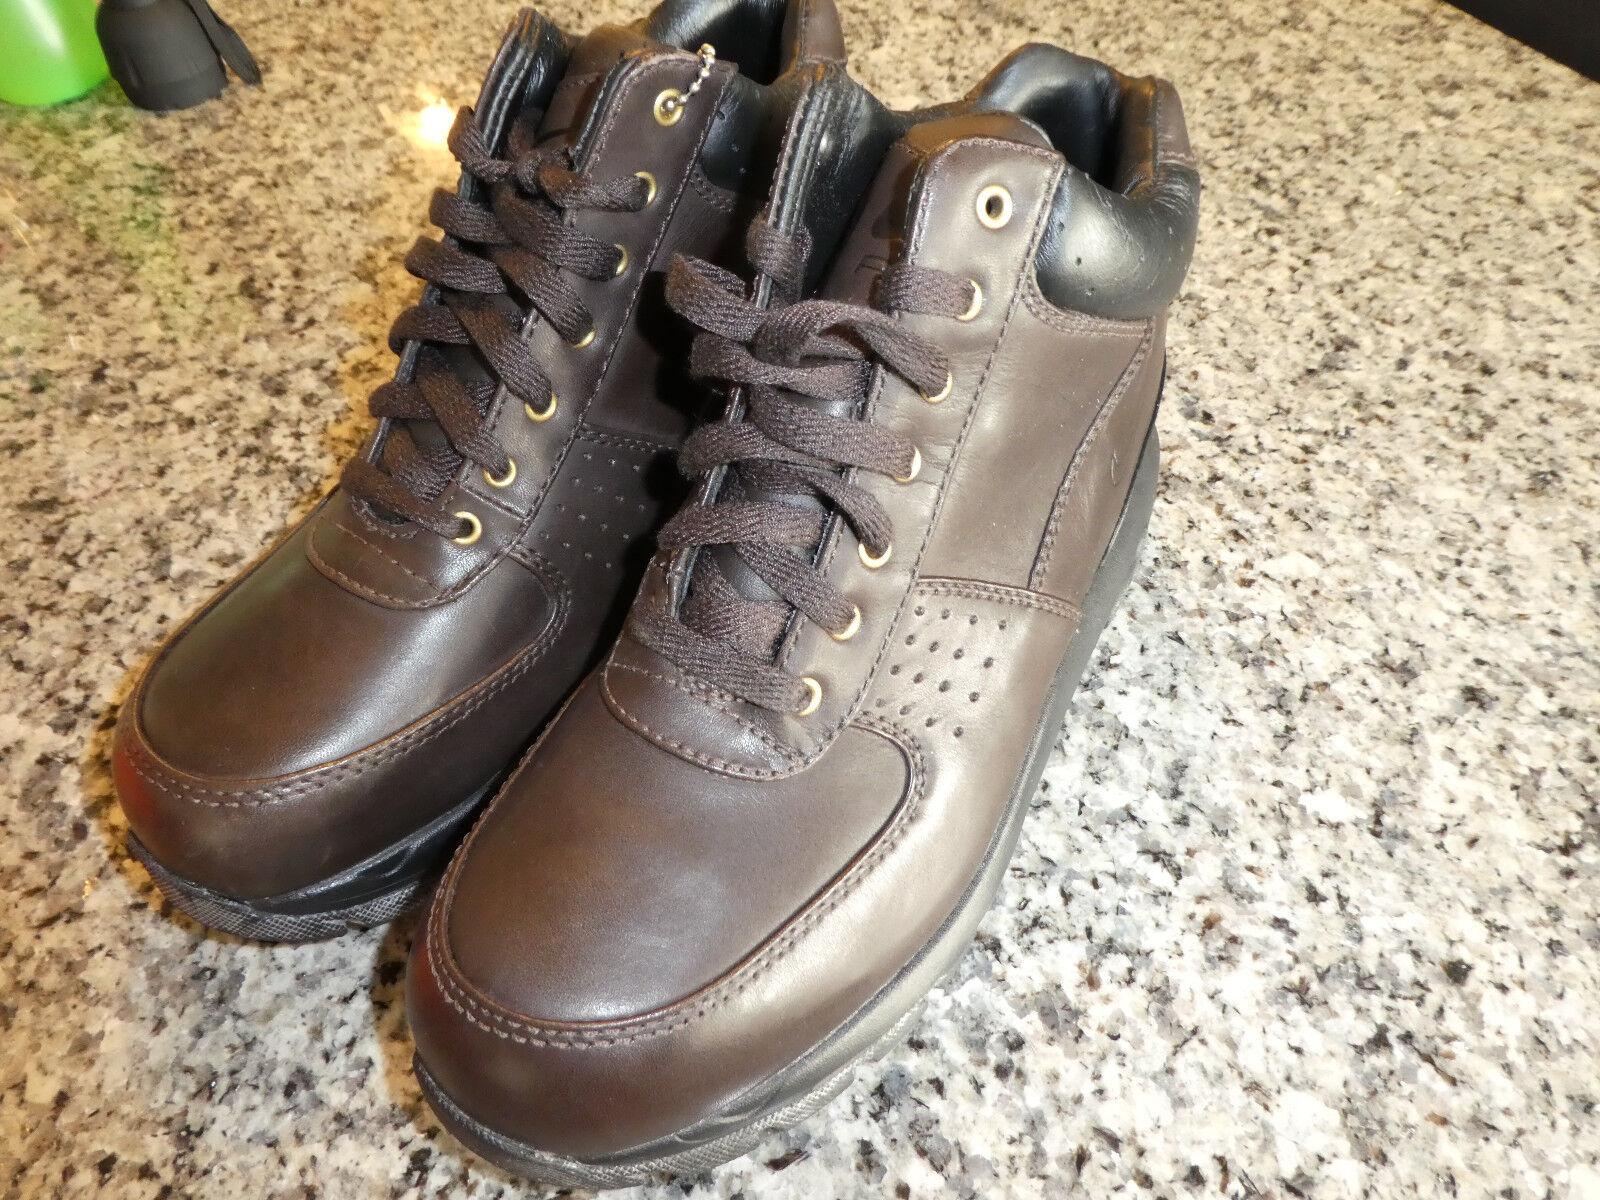 Nike Air Max Goadome mens boots brown 865031 200 new Cheap women's shoes women's shoes Cheap women's shoes women's shoes